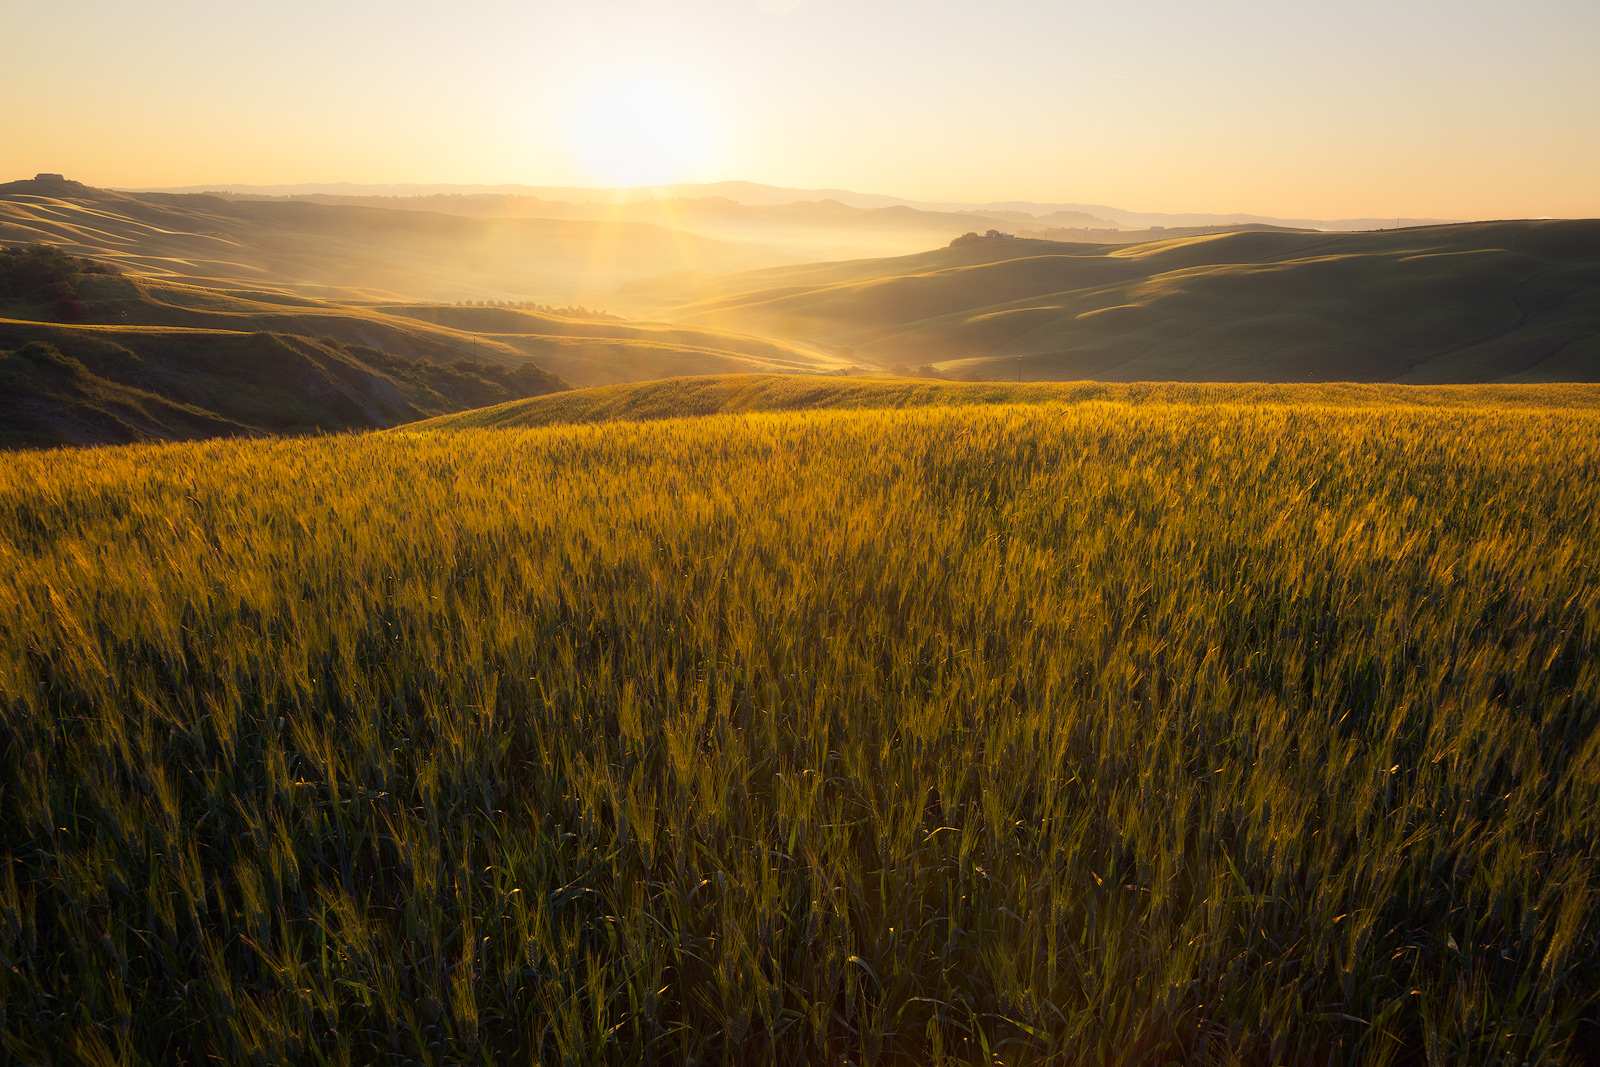 2016,May,Spring,arbia,cyprus,europe,fog,foggy,gold,golden,hills,horizontal,italy,landscape,mist,misty,morning,rolling,siena province,sunrise,tree,trees,tuscany,wheat fields, photo